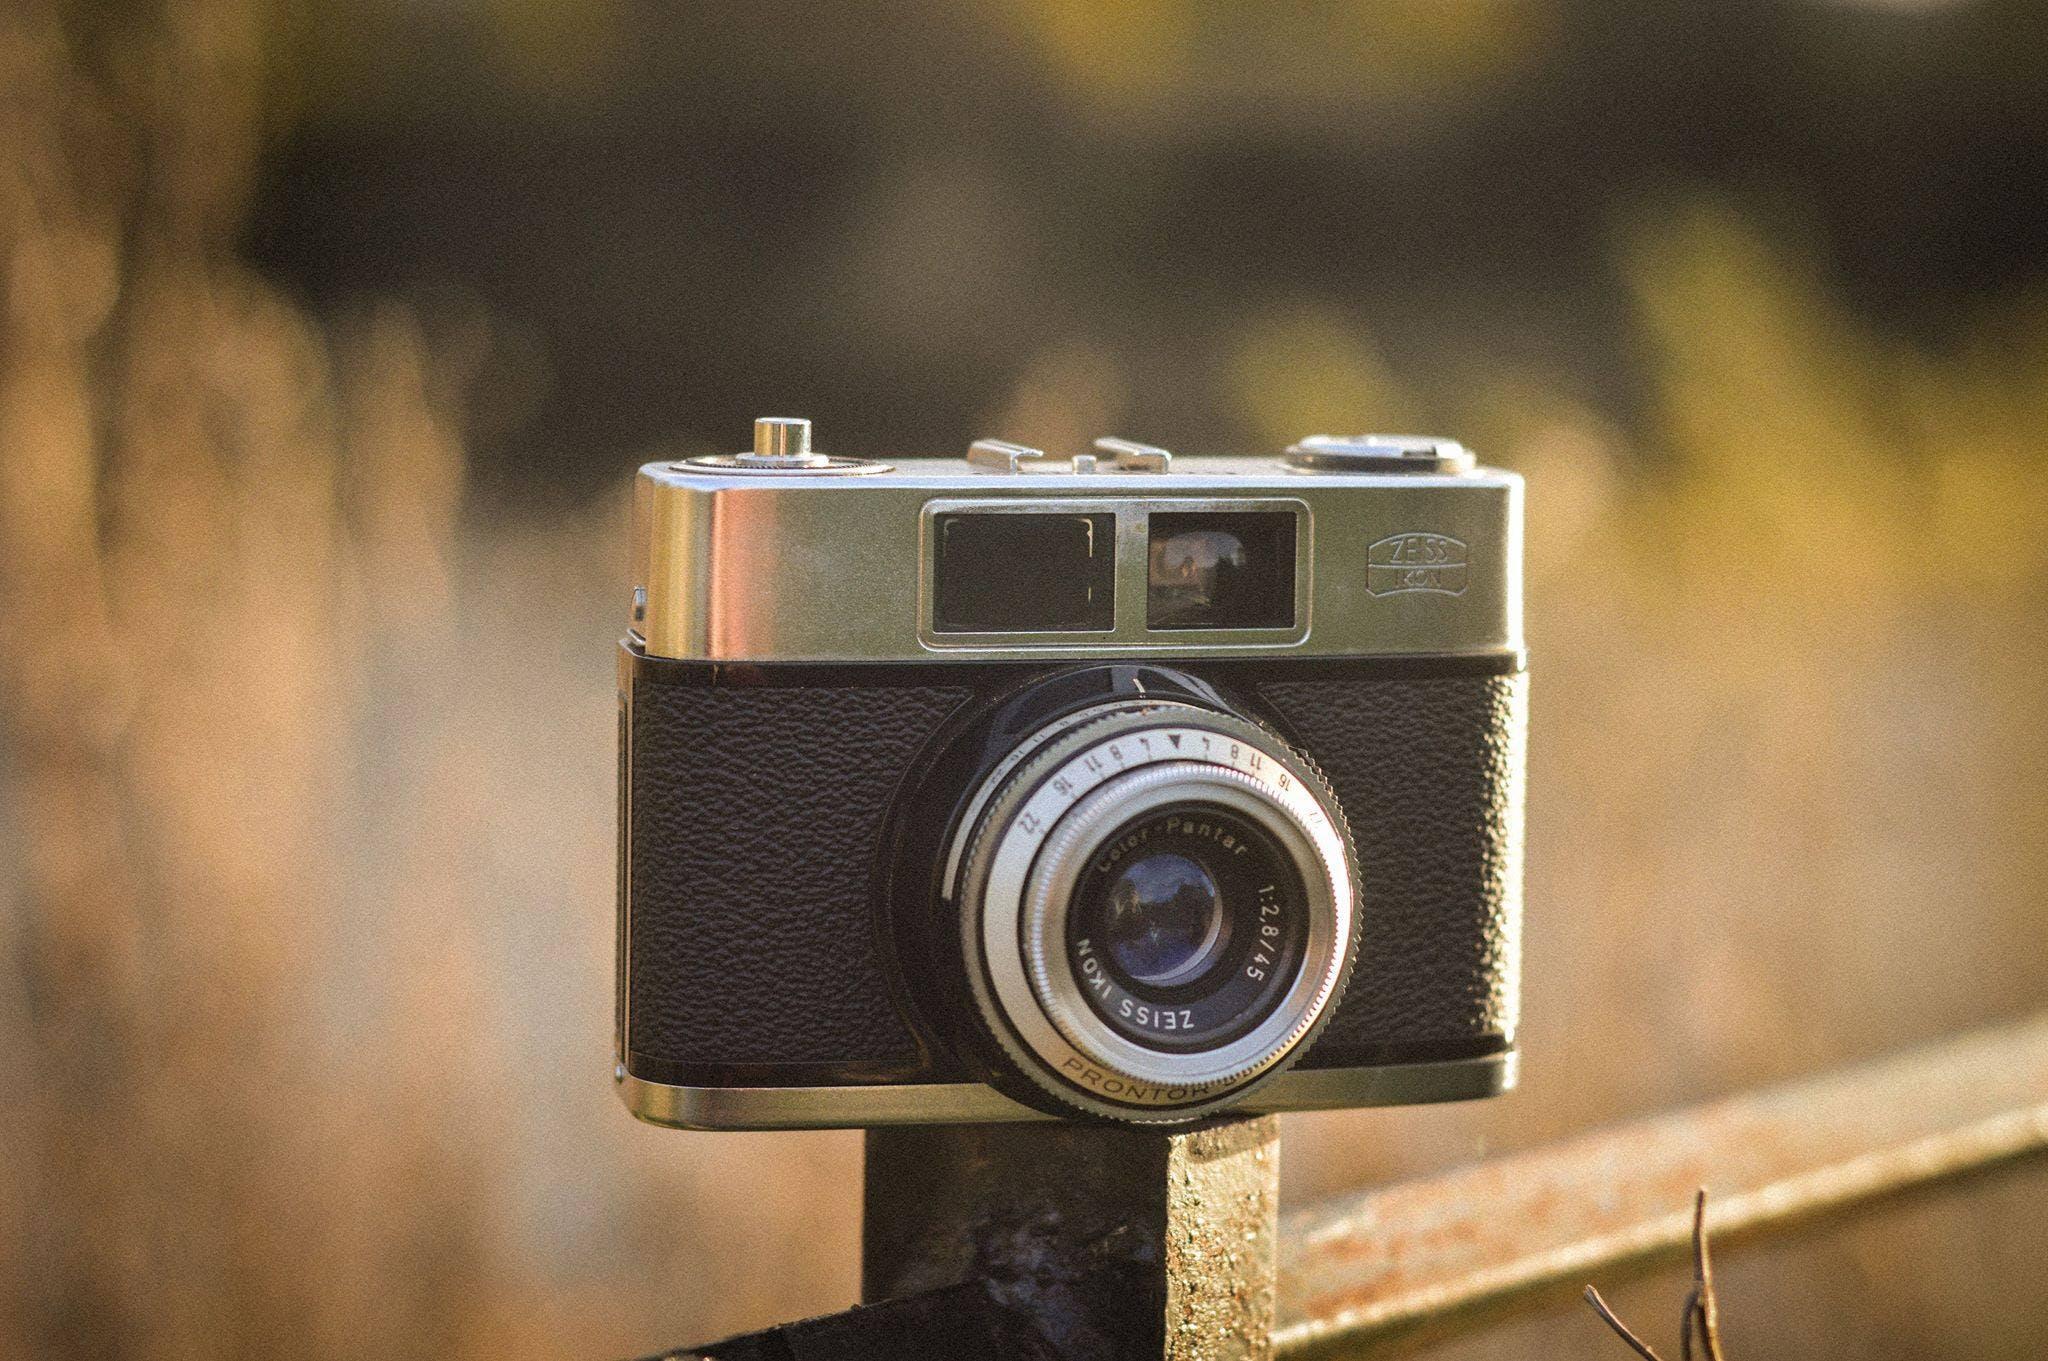 Gratis stockfoto met analoog, antiek, blurry achtergrond, camera